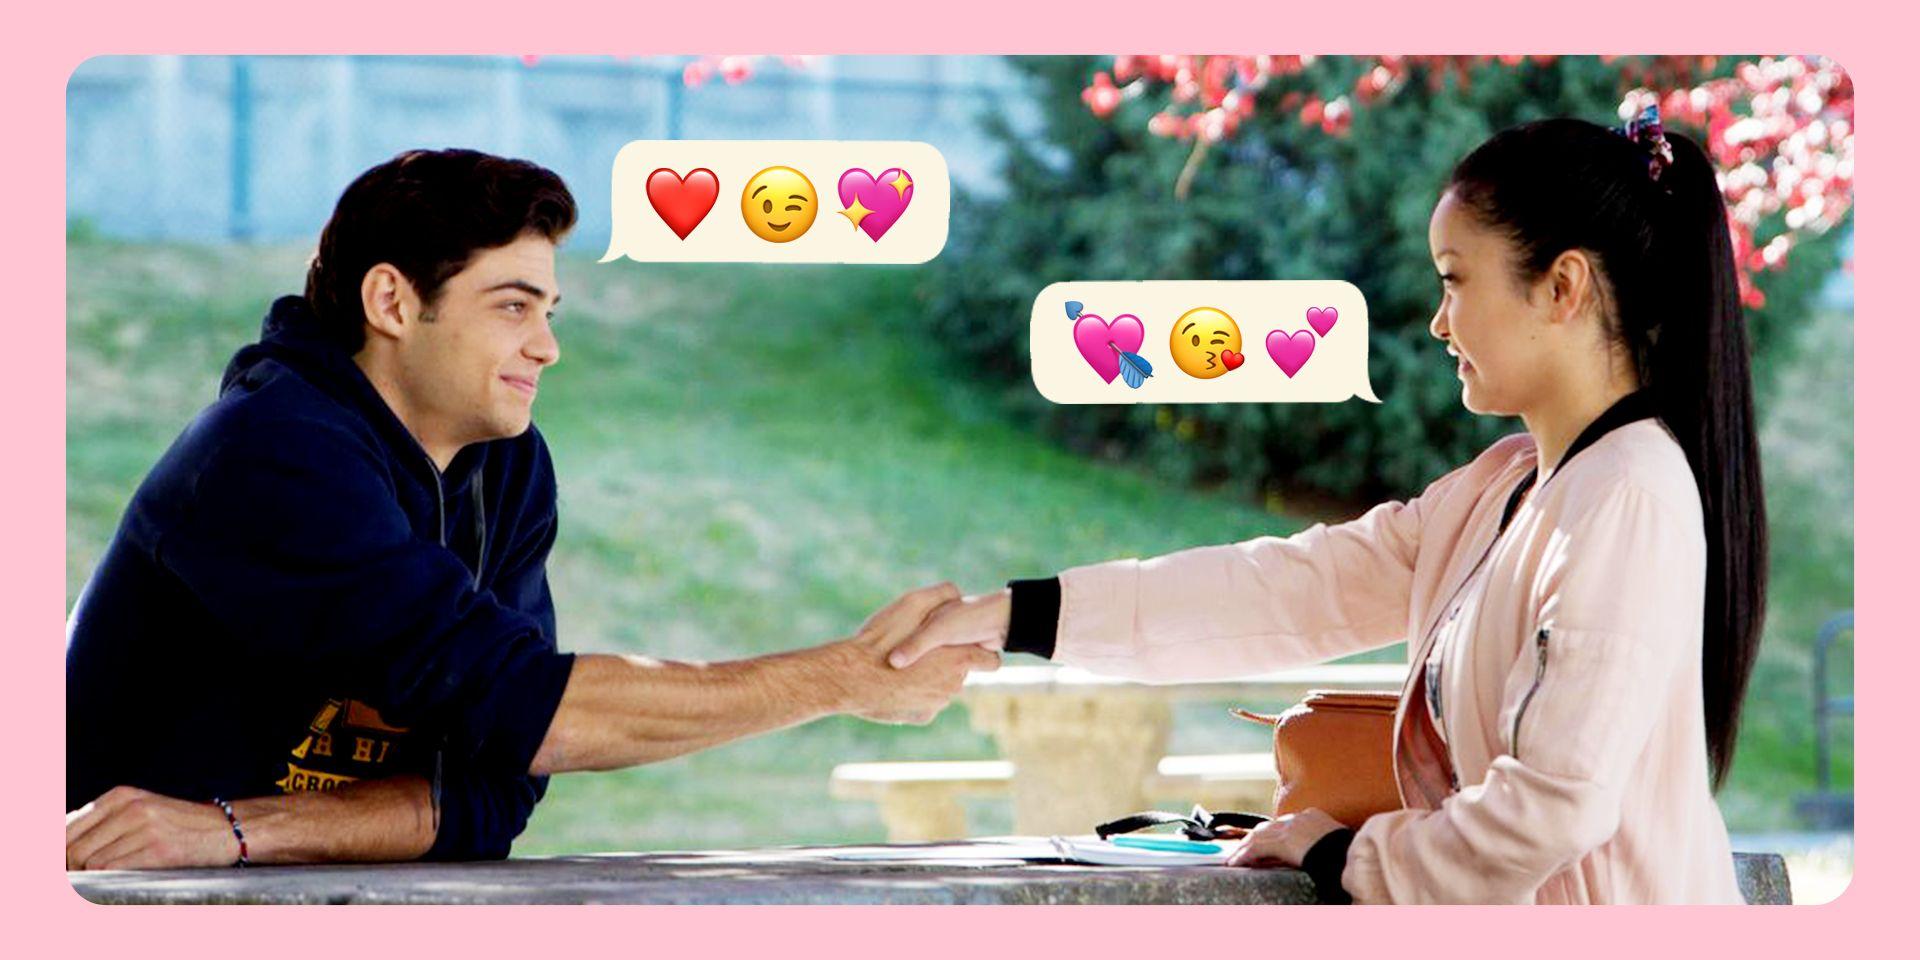 flirting moves that work through text meme maker game online